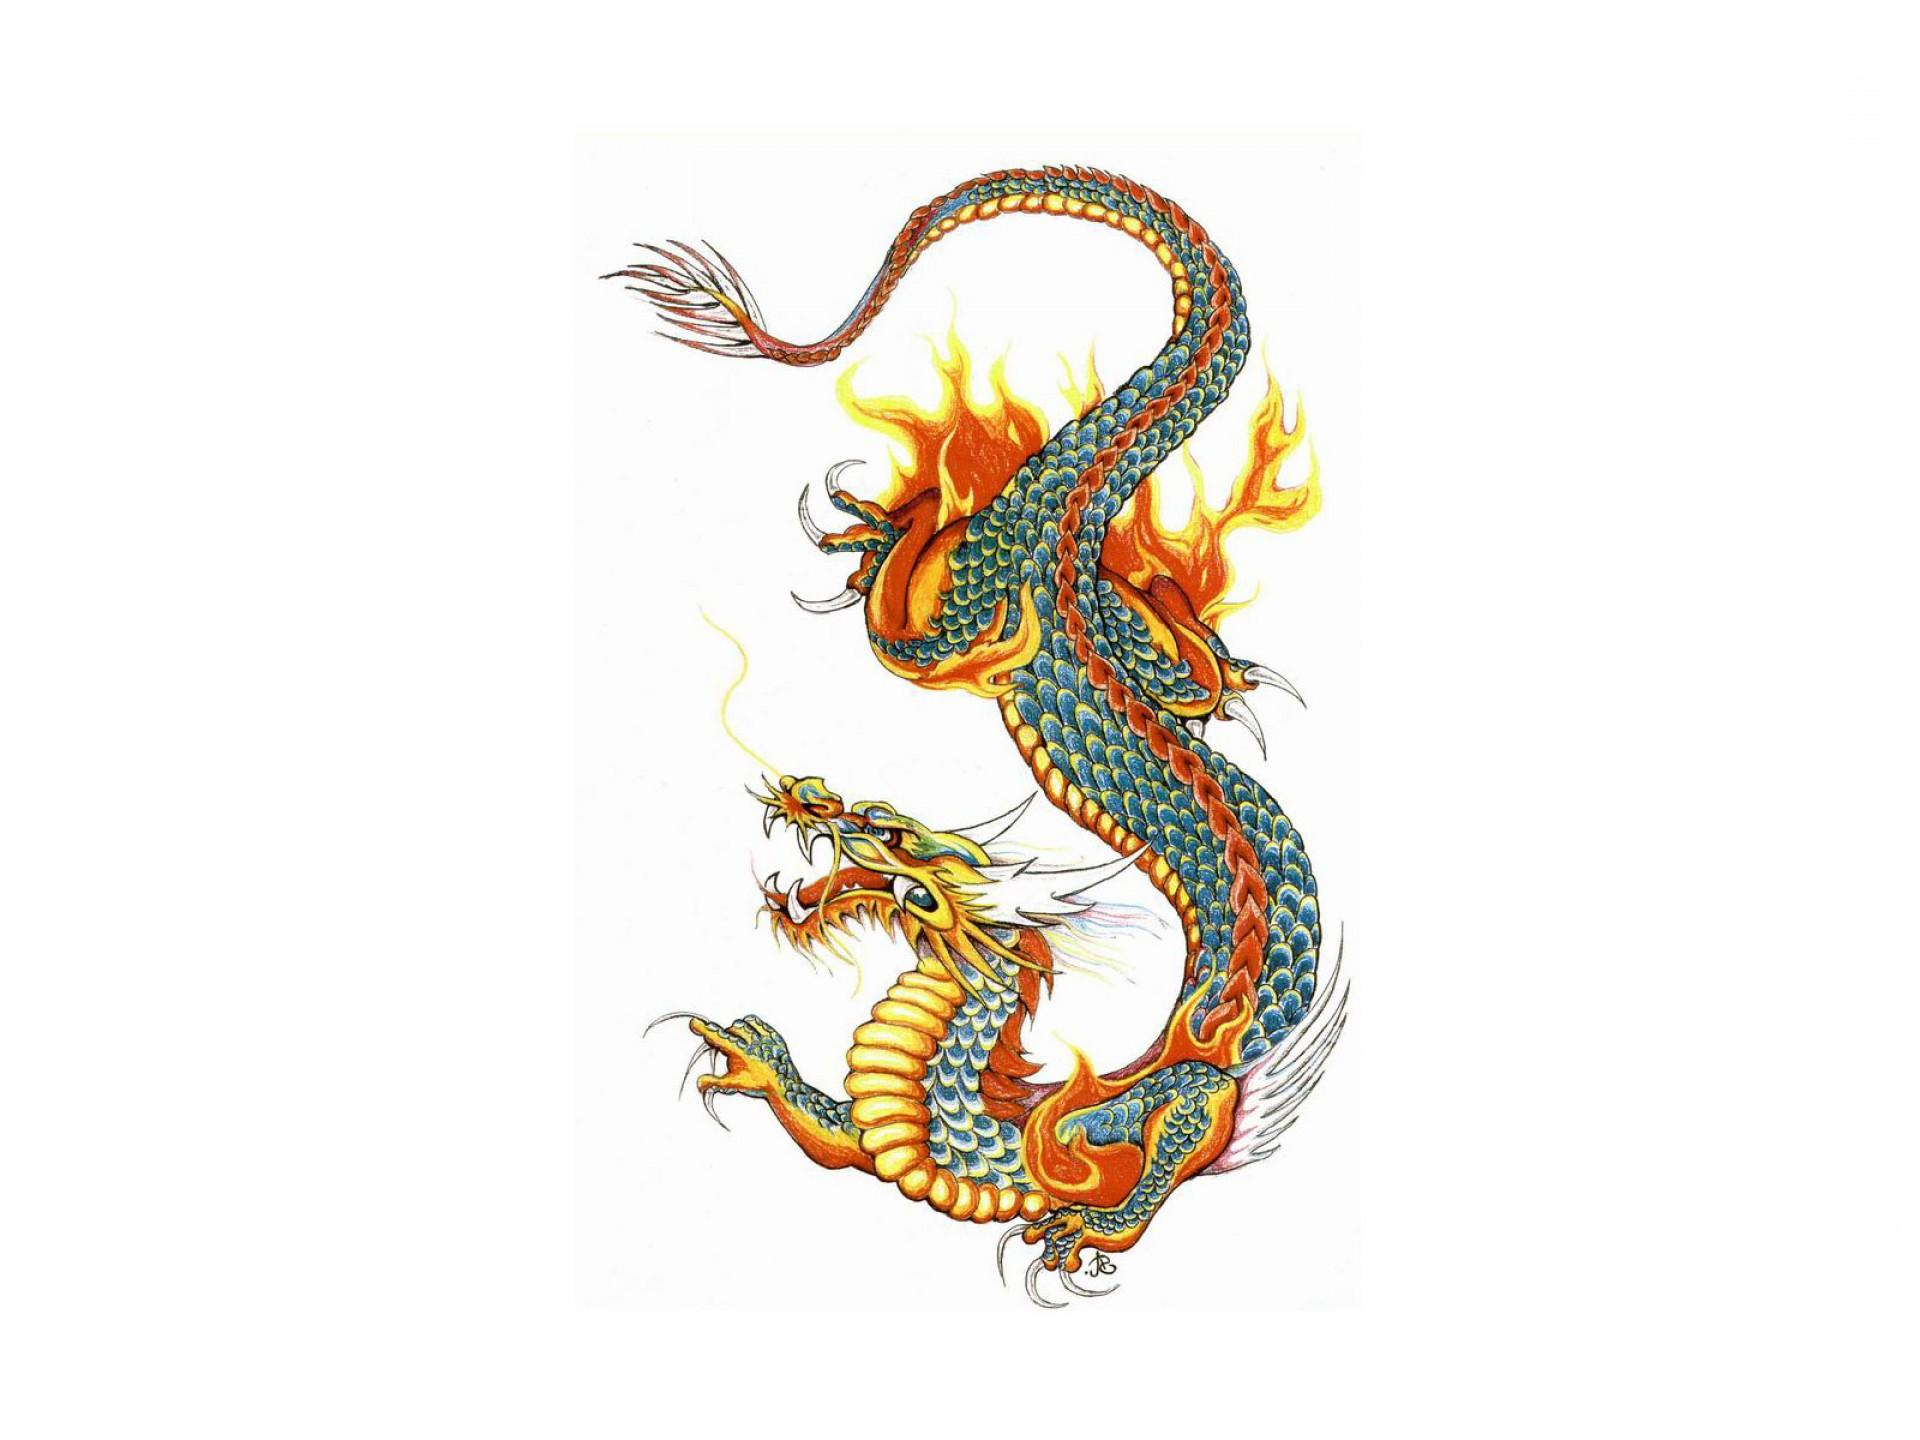 1920x1440 Dragon Head And Sword Tattoo Designs Soidergi